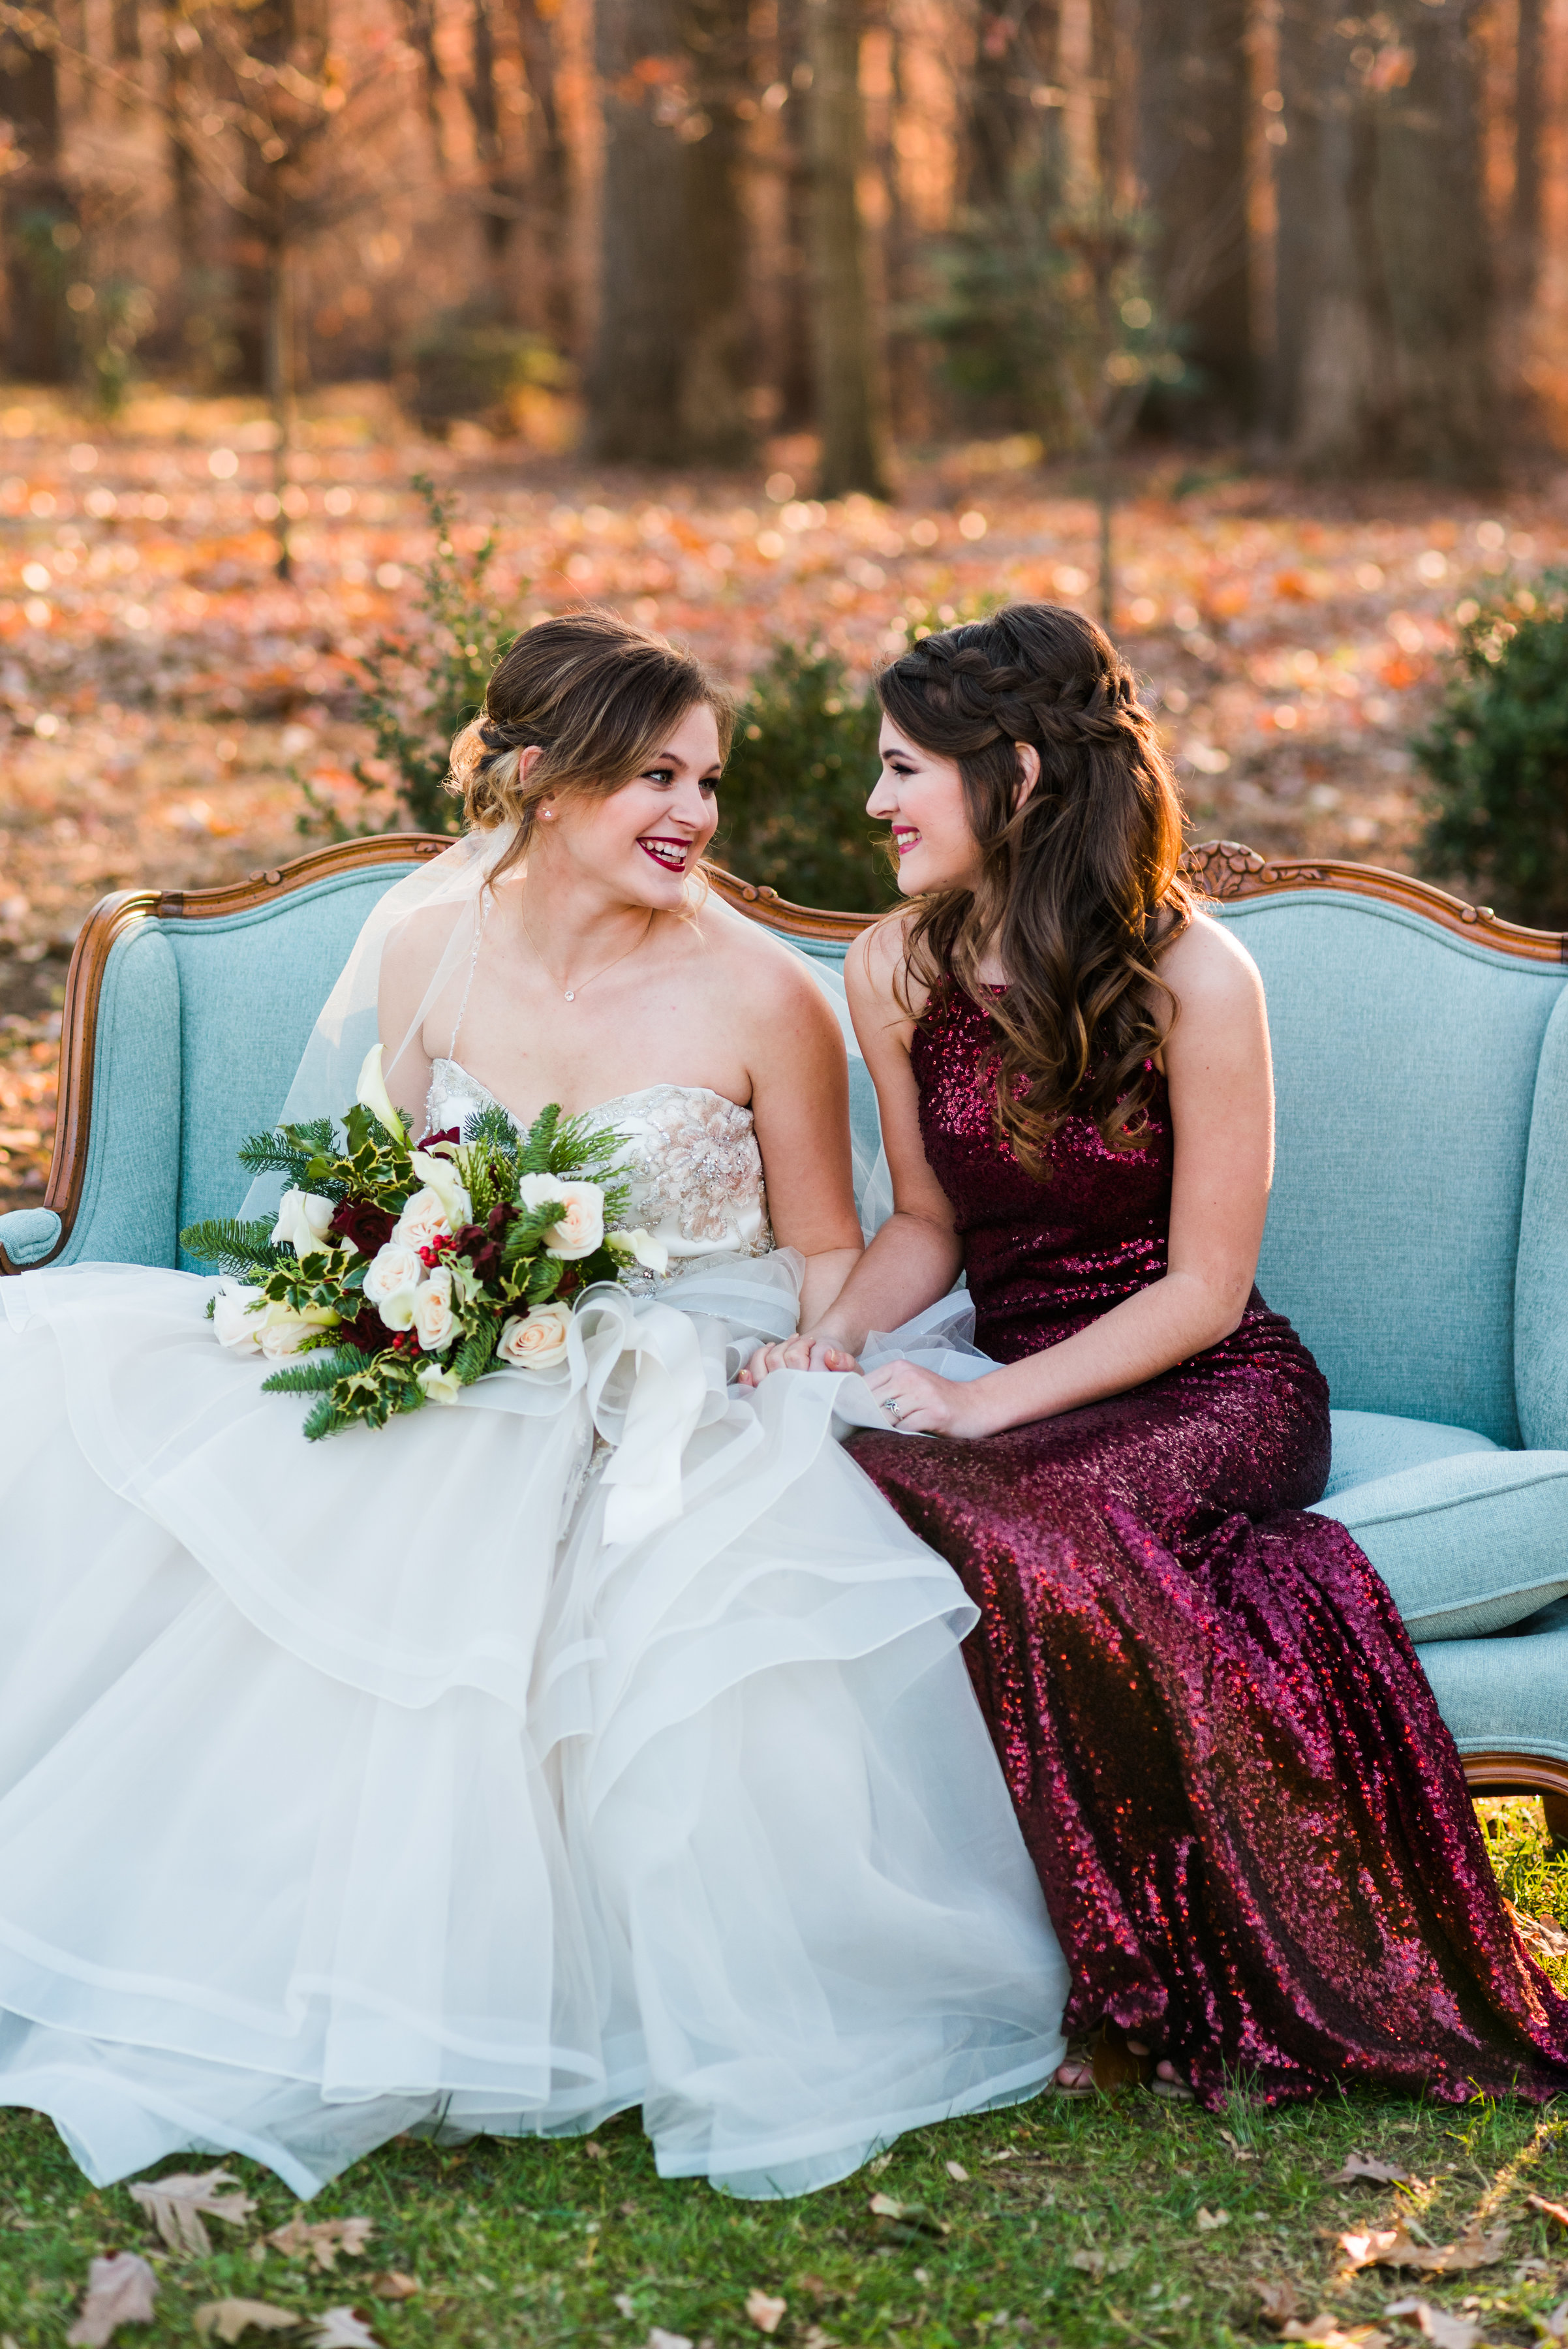 maryland-wedding-photographer-laremore-christmas-wedding-167.jpg